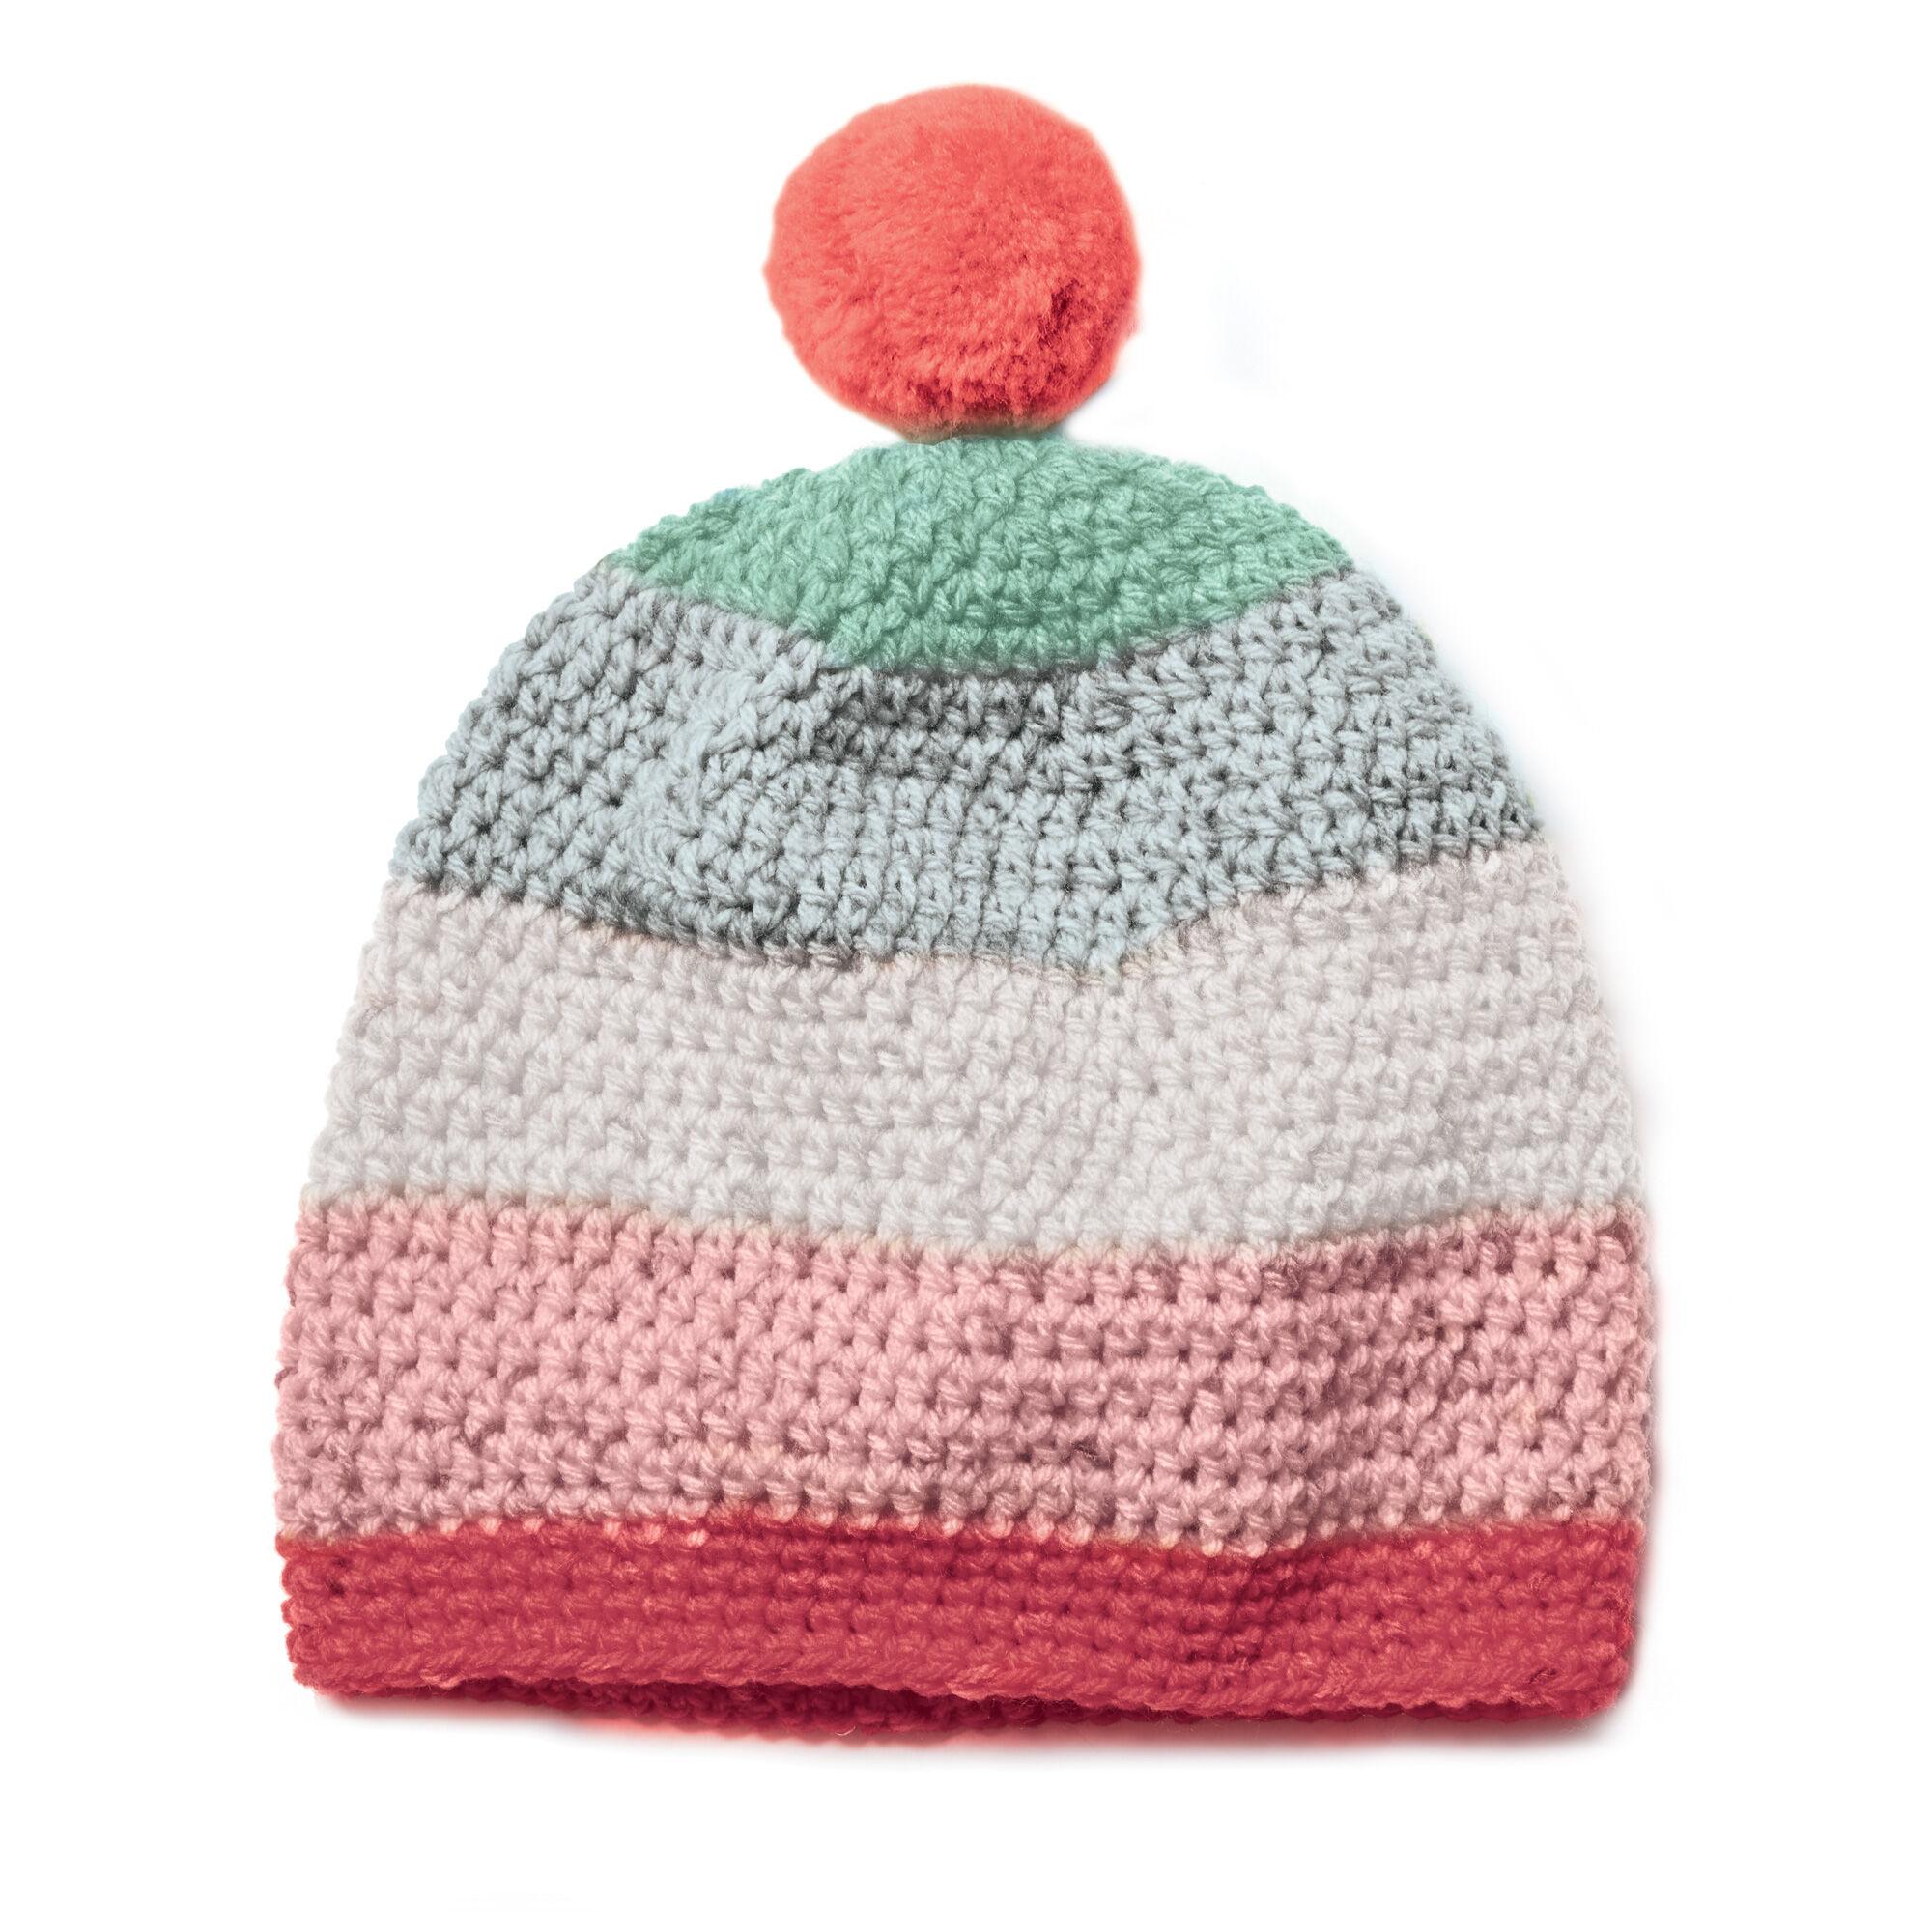 20-crochet-beanie-hat-ideas-for-men-and-women-the-best-of-2019